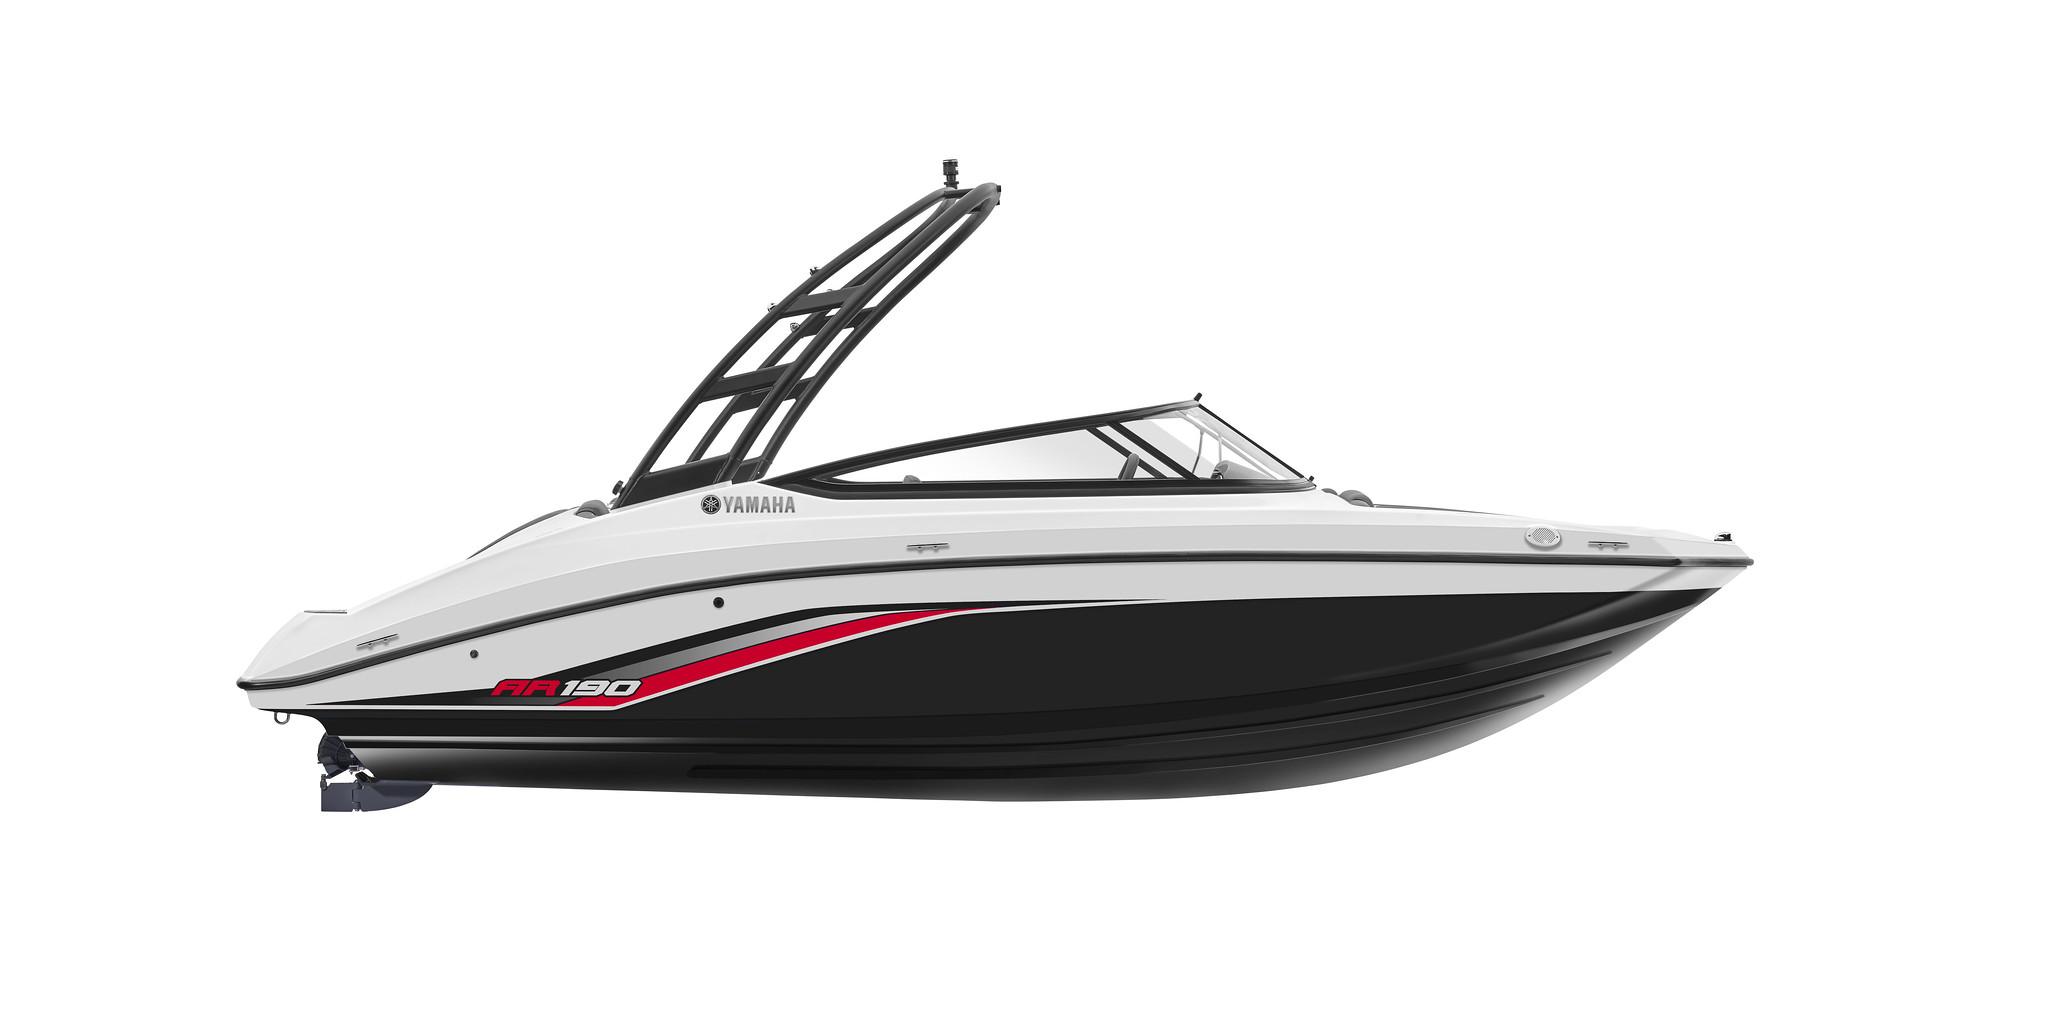 YamahaBoats AR190